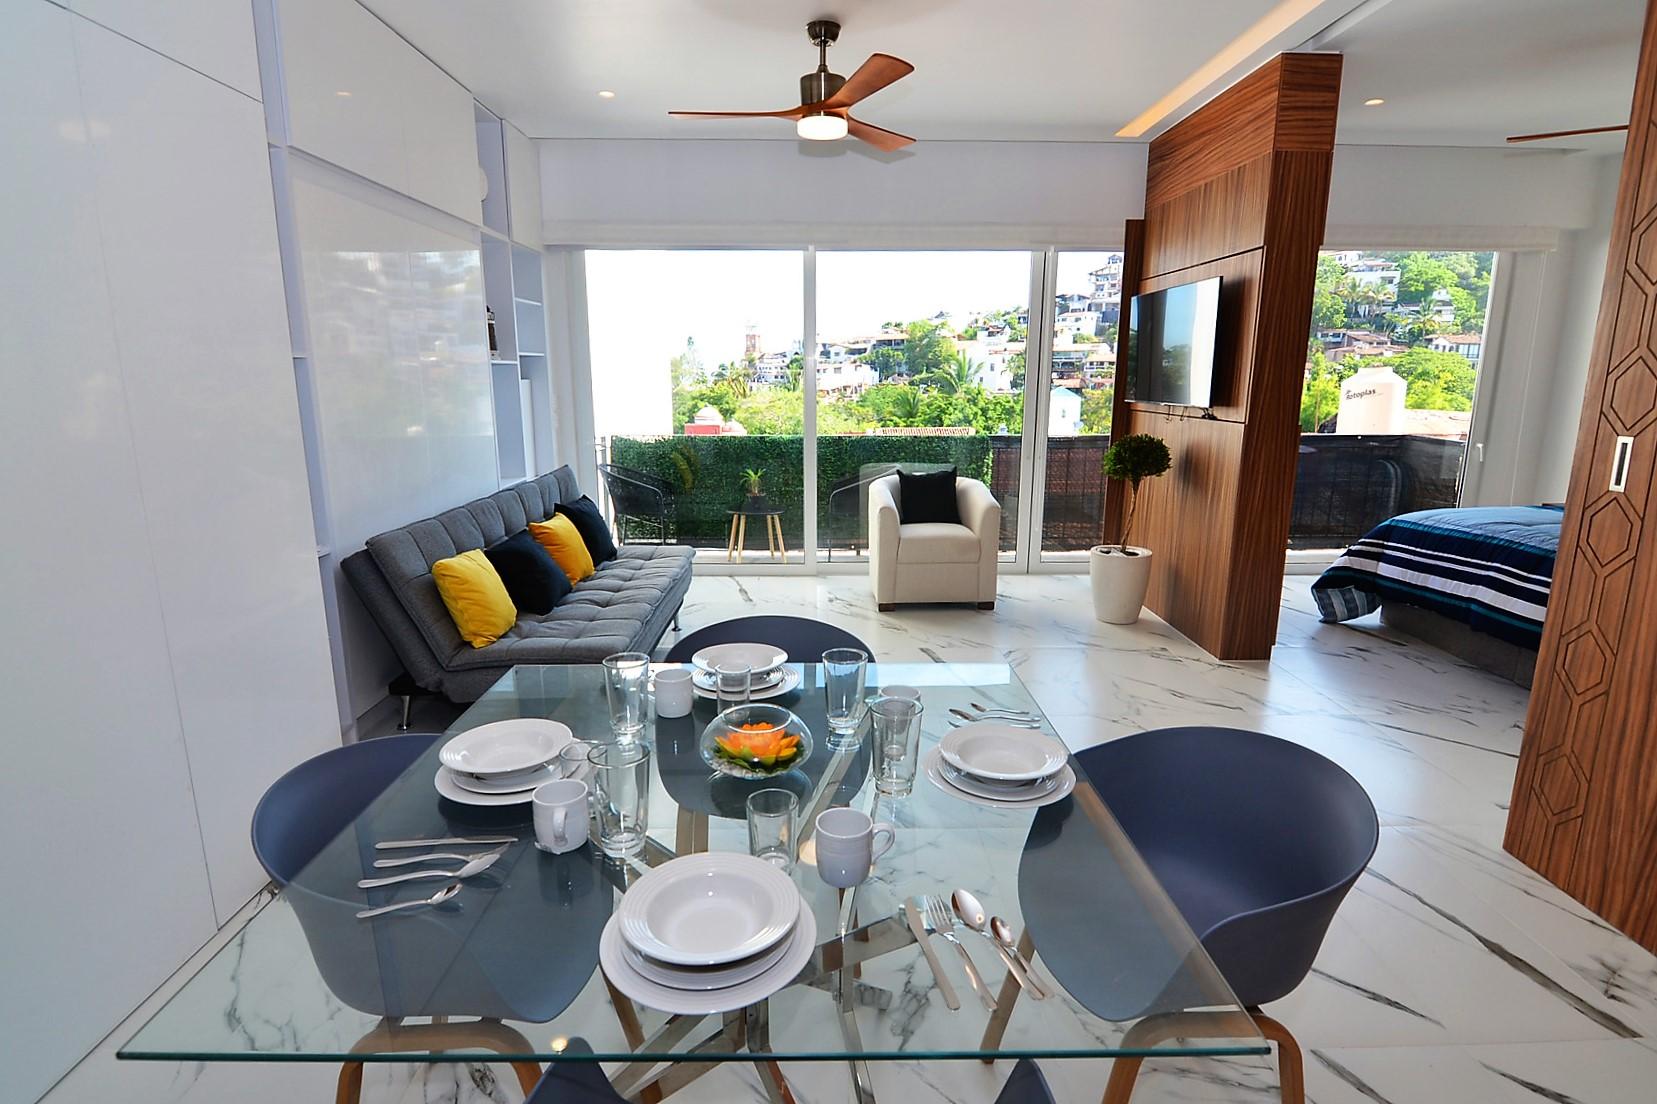 Condo Avida Super Studio 4 - Puerto Vallarta Furnished Condo Romantic Zone (2)